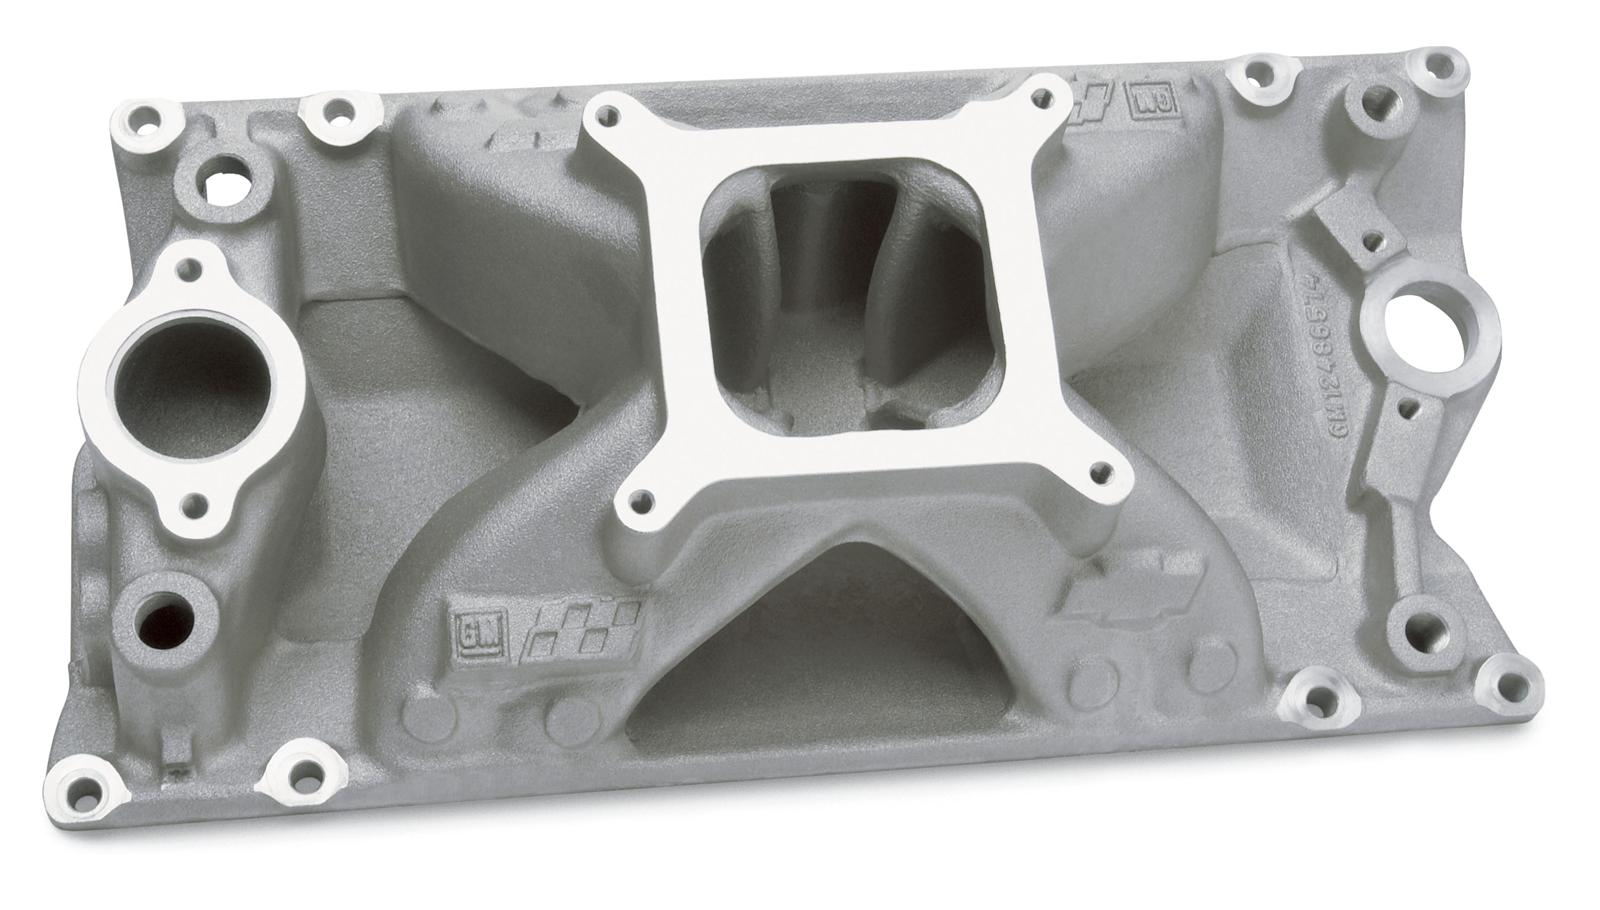 Chevrolet Performance Eliminator Vortec Intake Manifolds 12496822